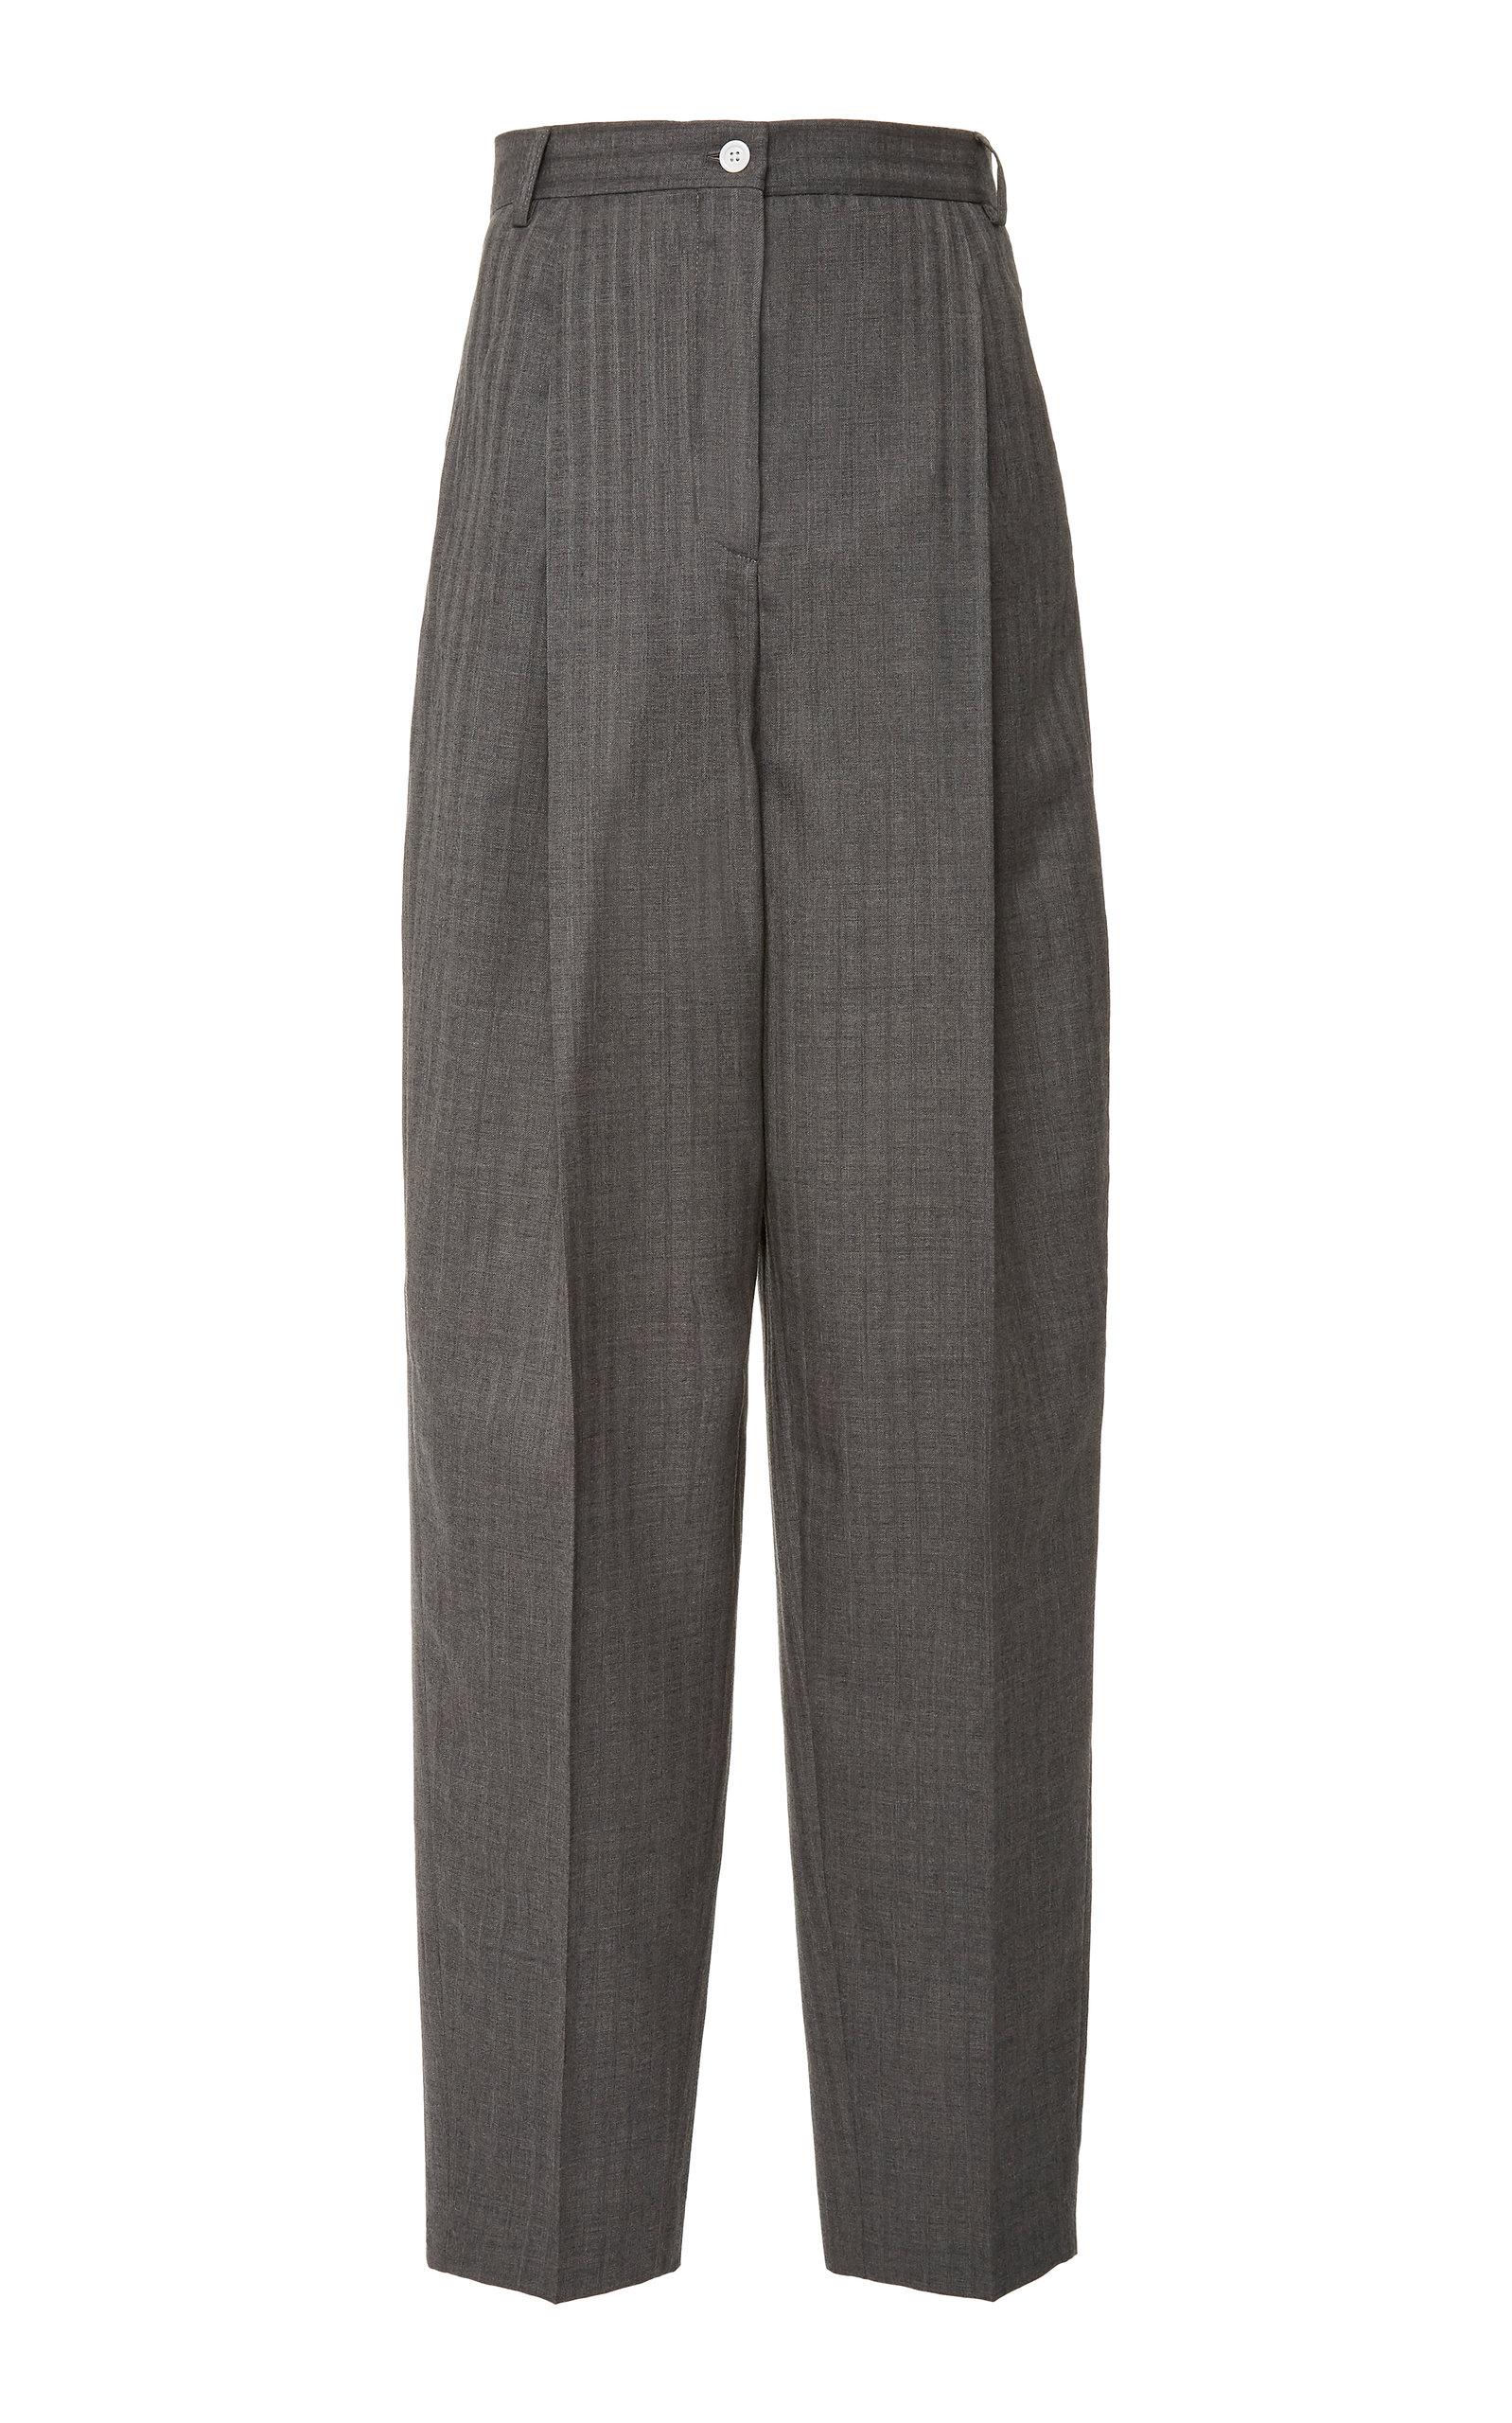 Acne Studios Pants Peggerine Striped Wool Pants